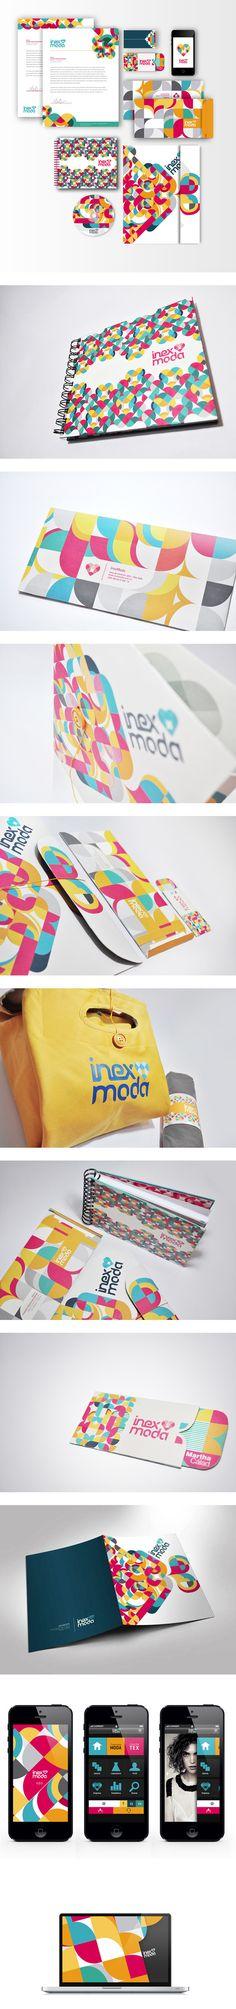 InexModa - branding redesign  colorful #identity #packaging #branding